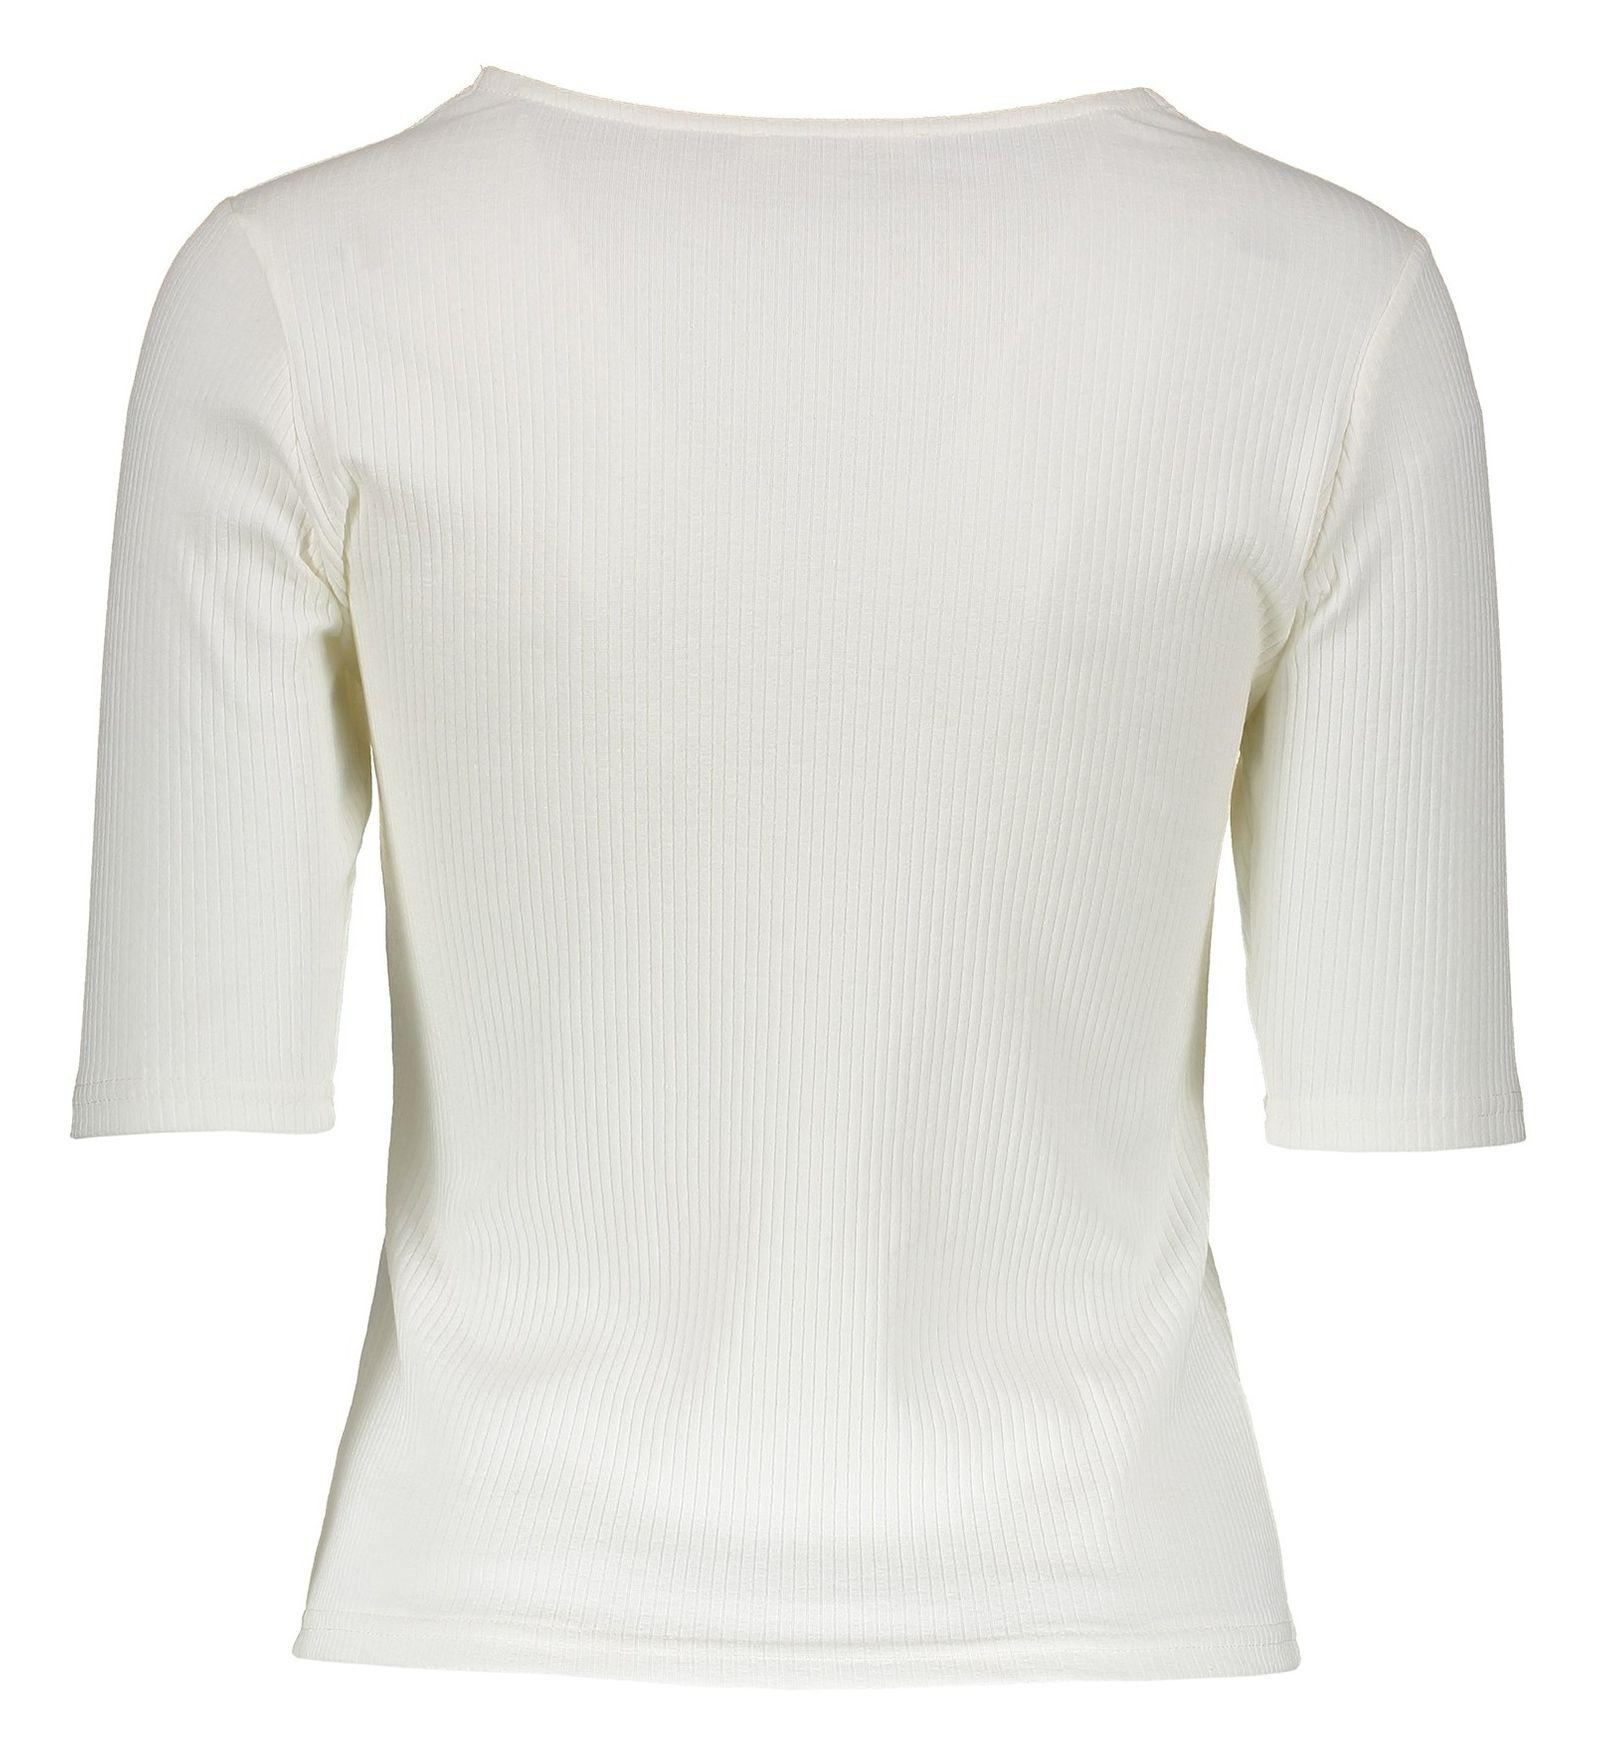 تی شرت نخی زنانه - جنیفر - سفيد - 2